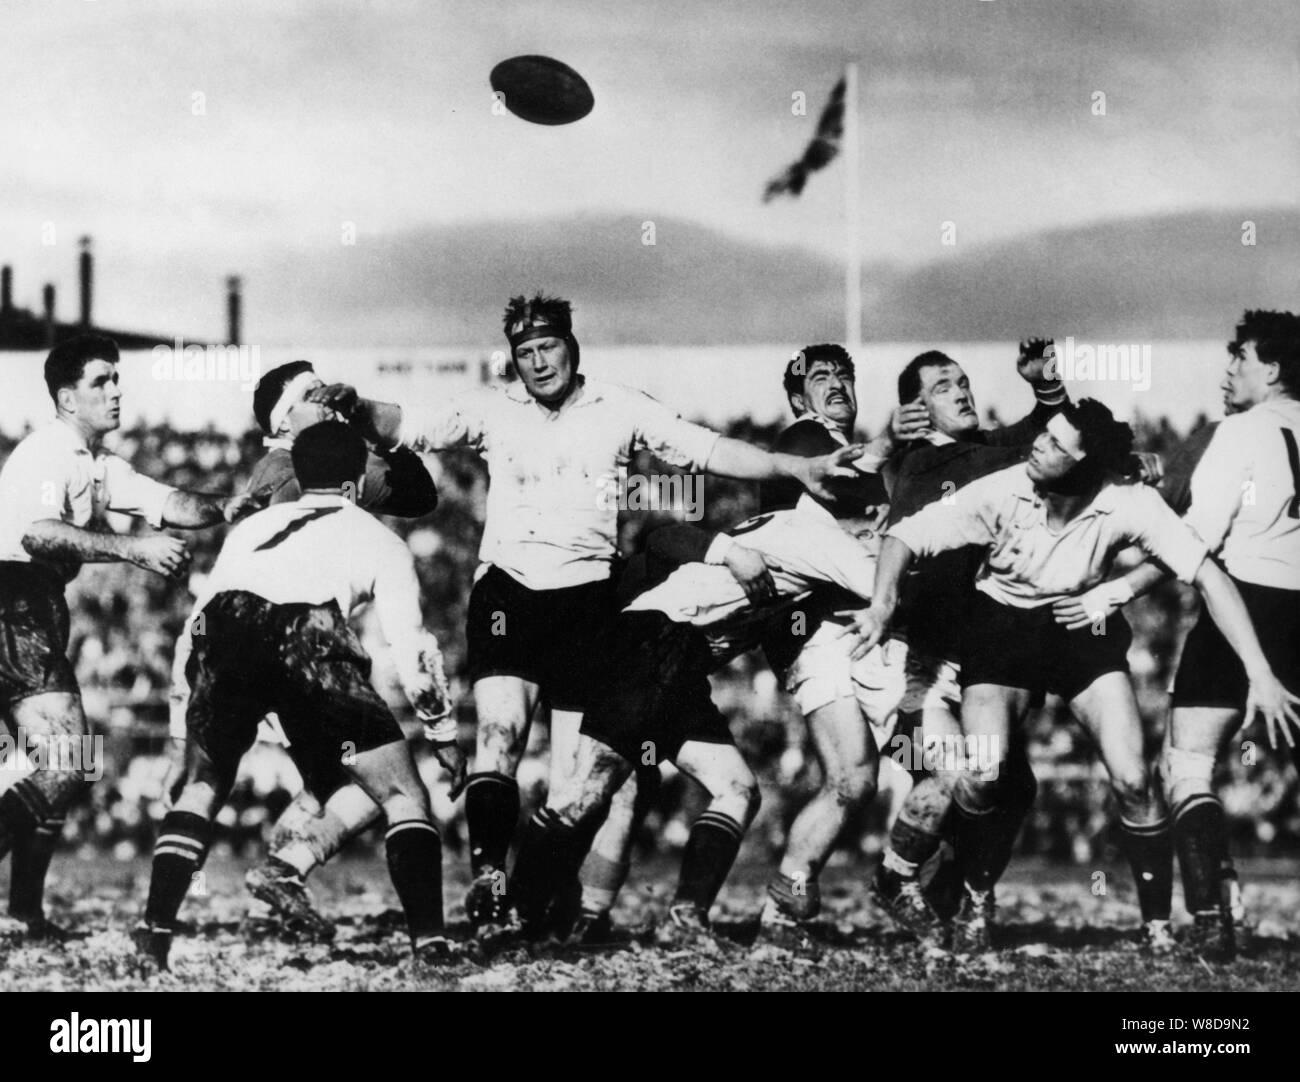 Oceania, New Zealand, Rugby, France beats Otago, 1961 Stock Photo